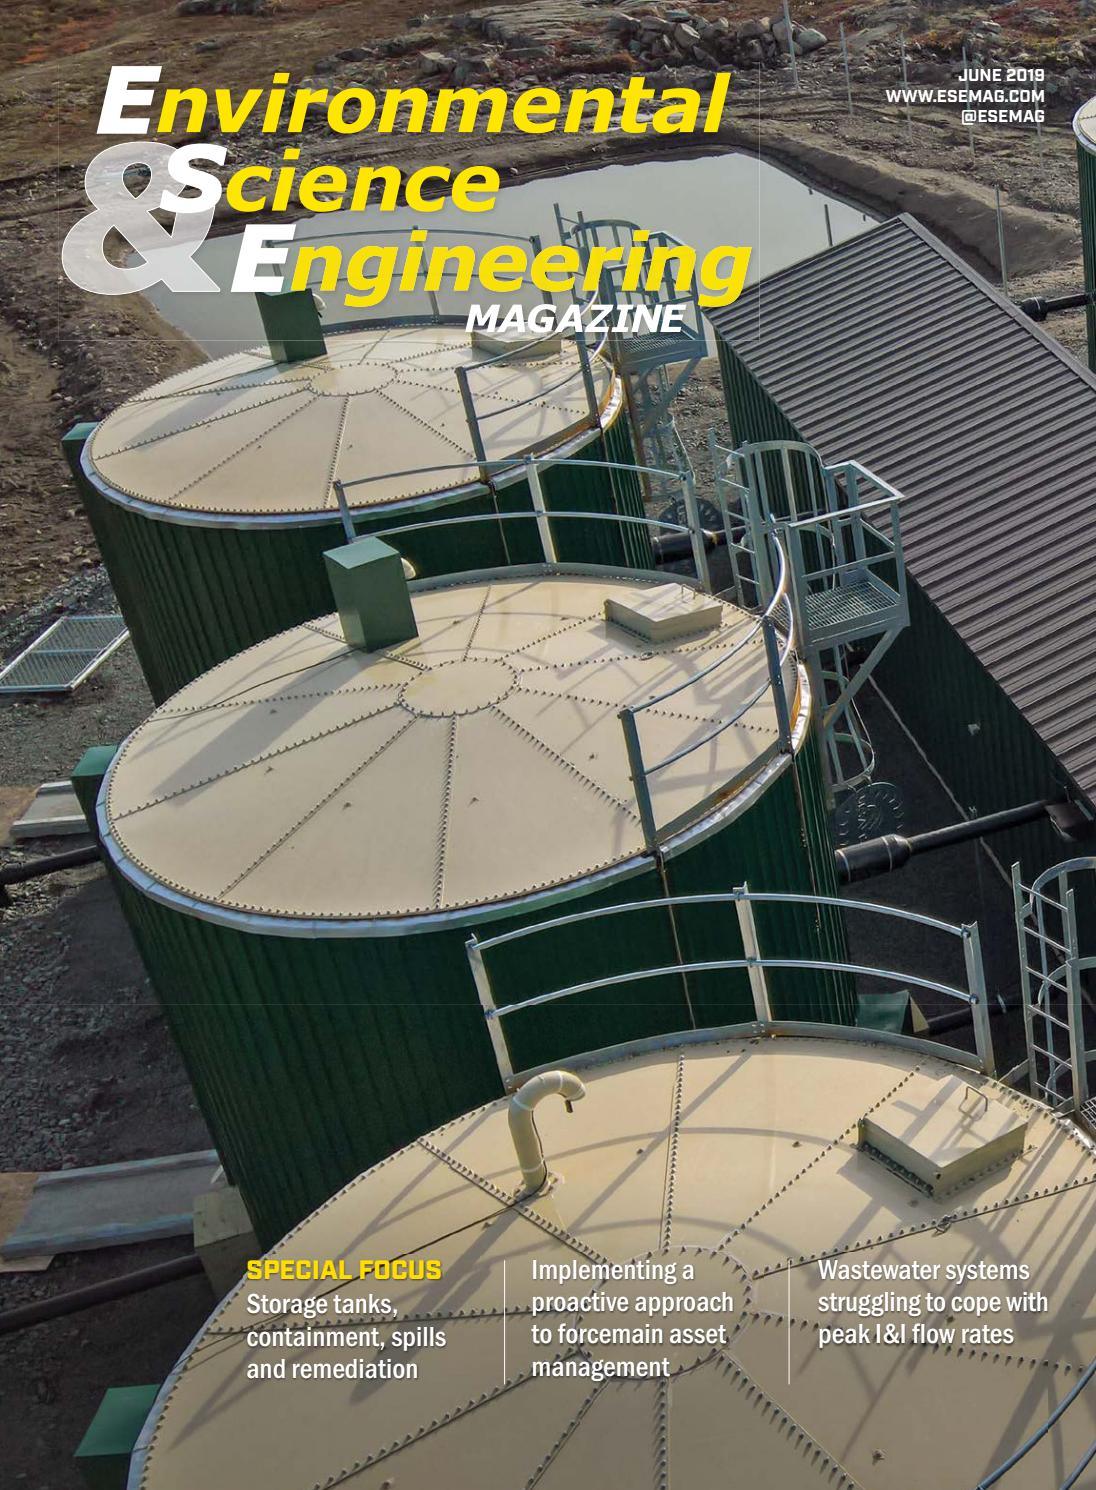 Environmental Science & Engineering Magazine | June 2019 by